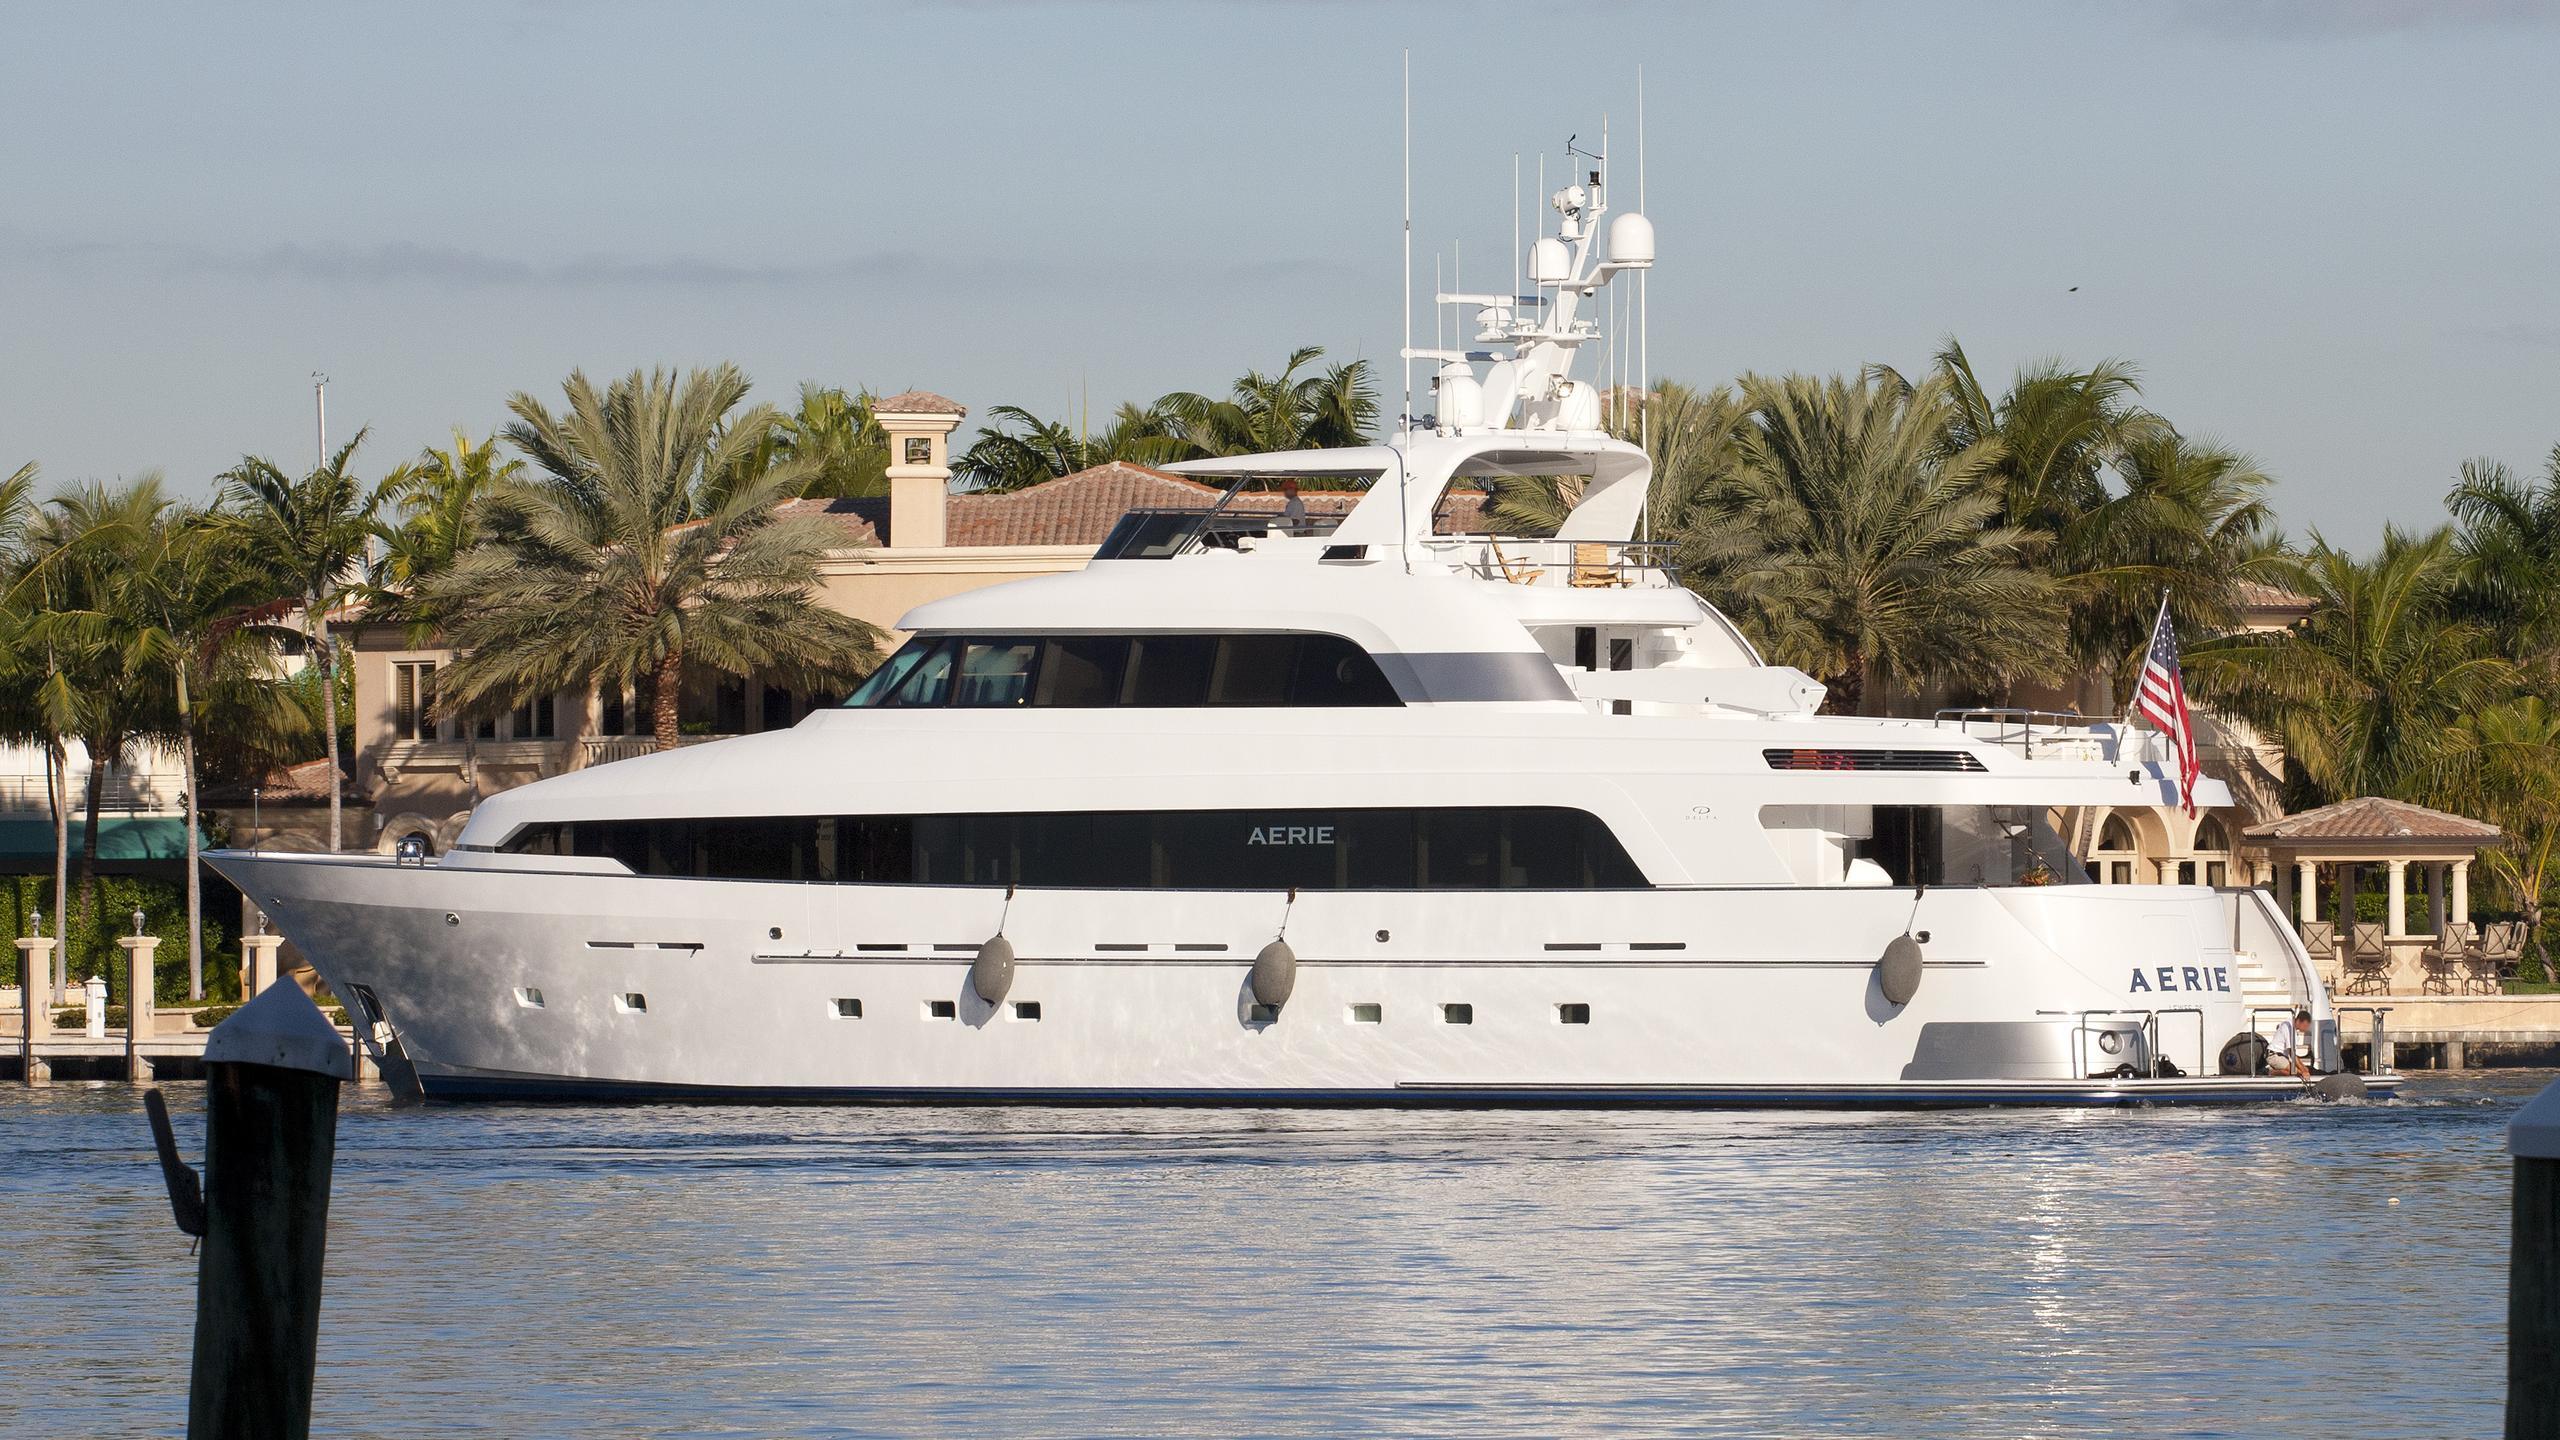 spirit-motor-yacht-delta-124-2001-38m-profile